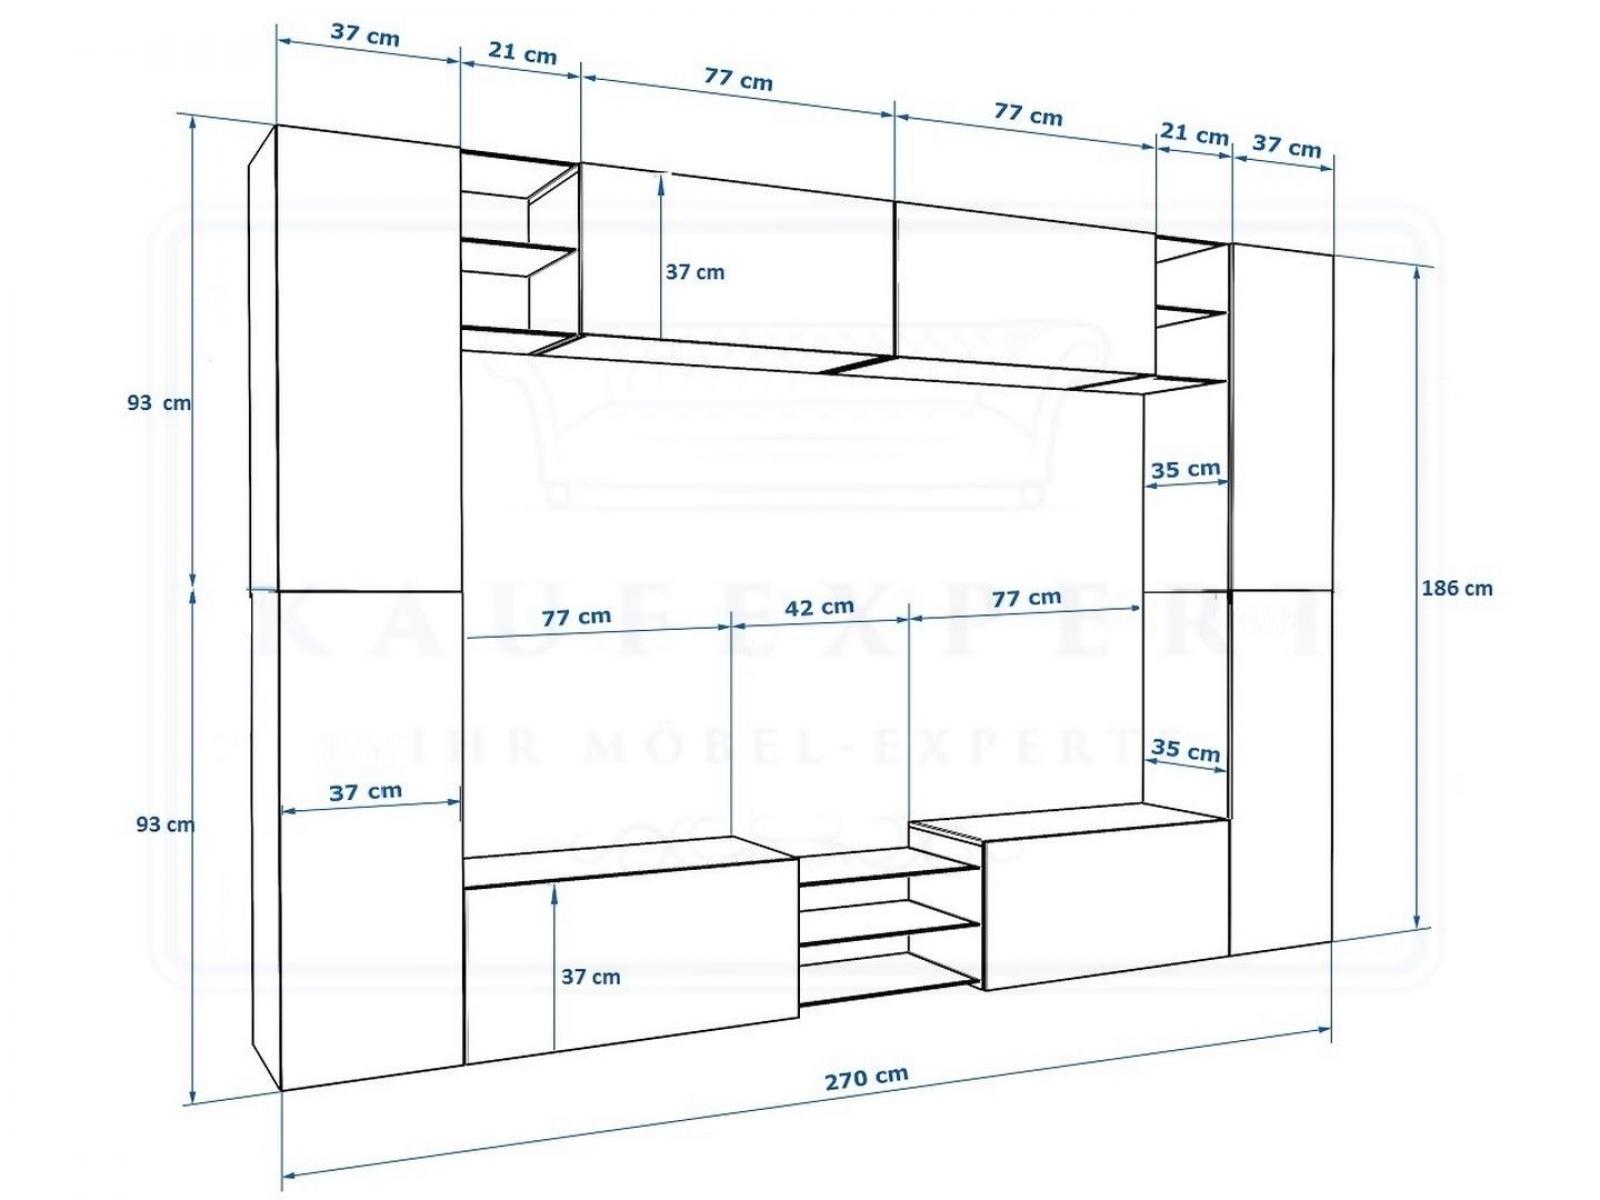 kaufexpert wohnwand kino wei hochglanz wei mediawand medienwand design modern led. Black Bedroom Furniture Sets. Home Design Ideas